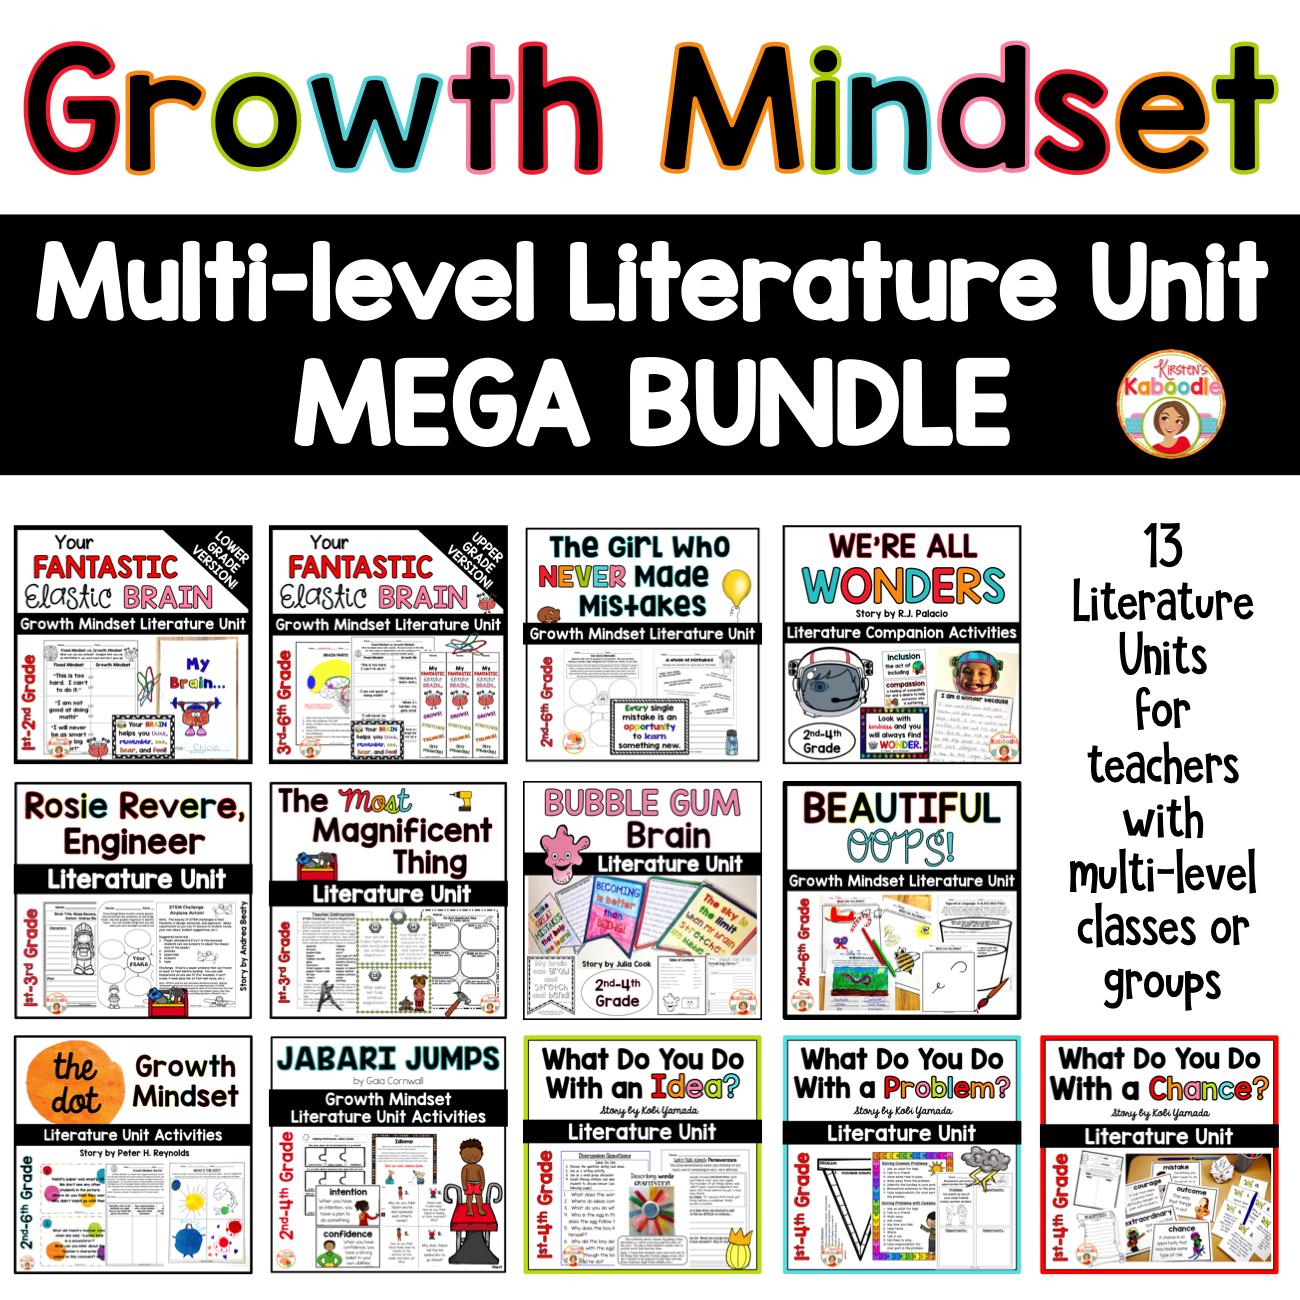 Growth Mindset Multi-level Literature Unit BUNDLE